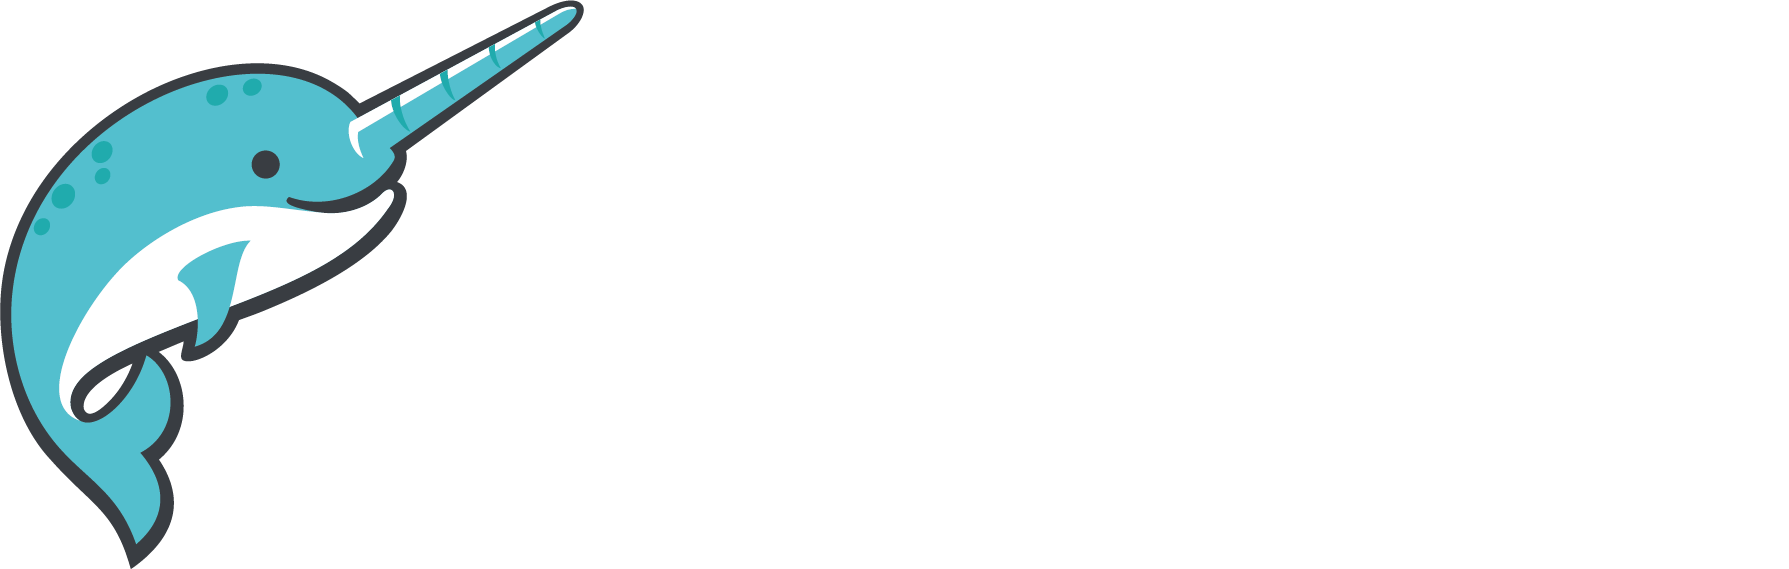 Dremio University Home Page